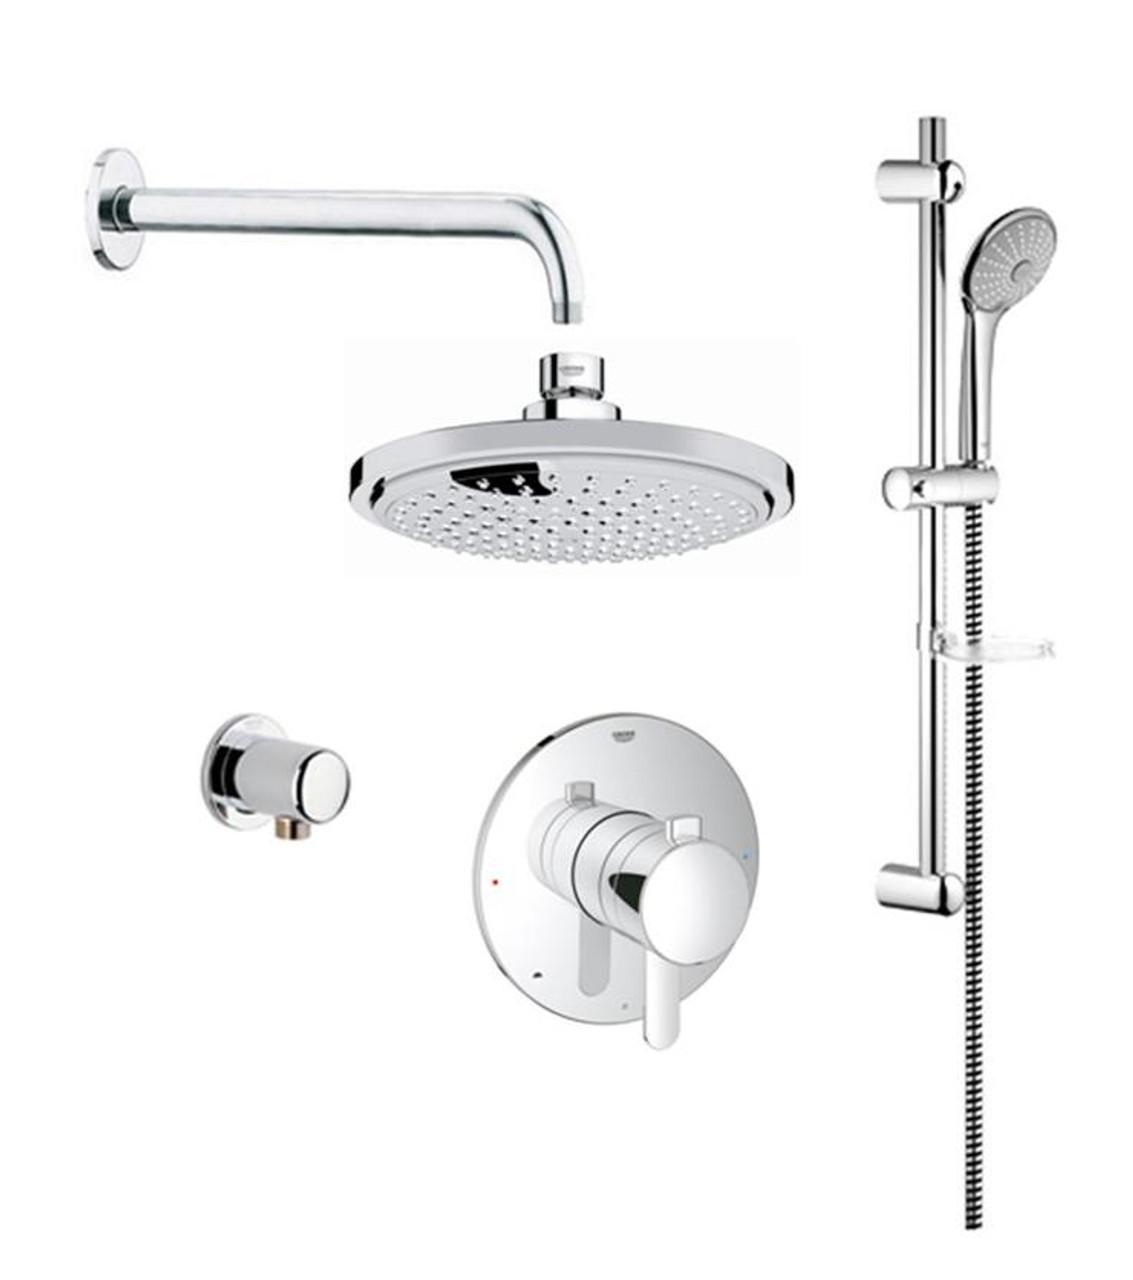 Grohe Cosmopolitan PBV Dual Function Shower Kit - York Taps